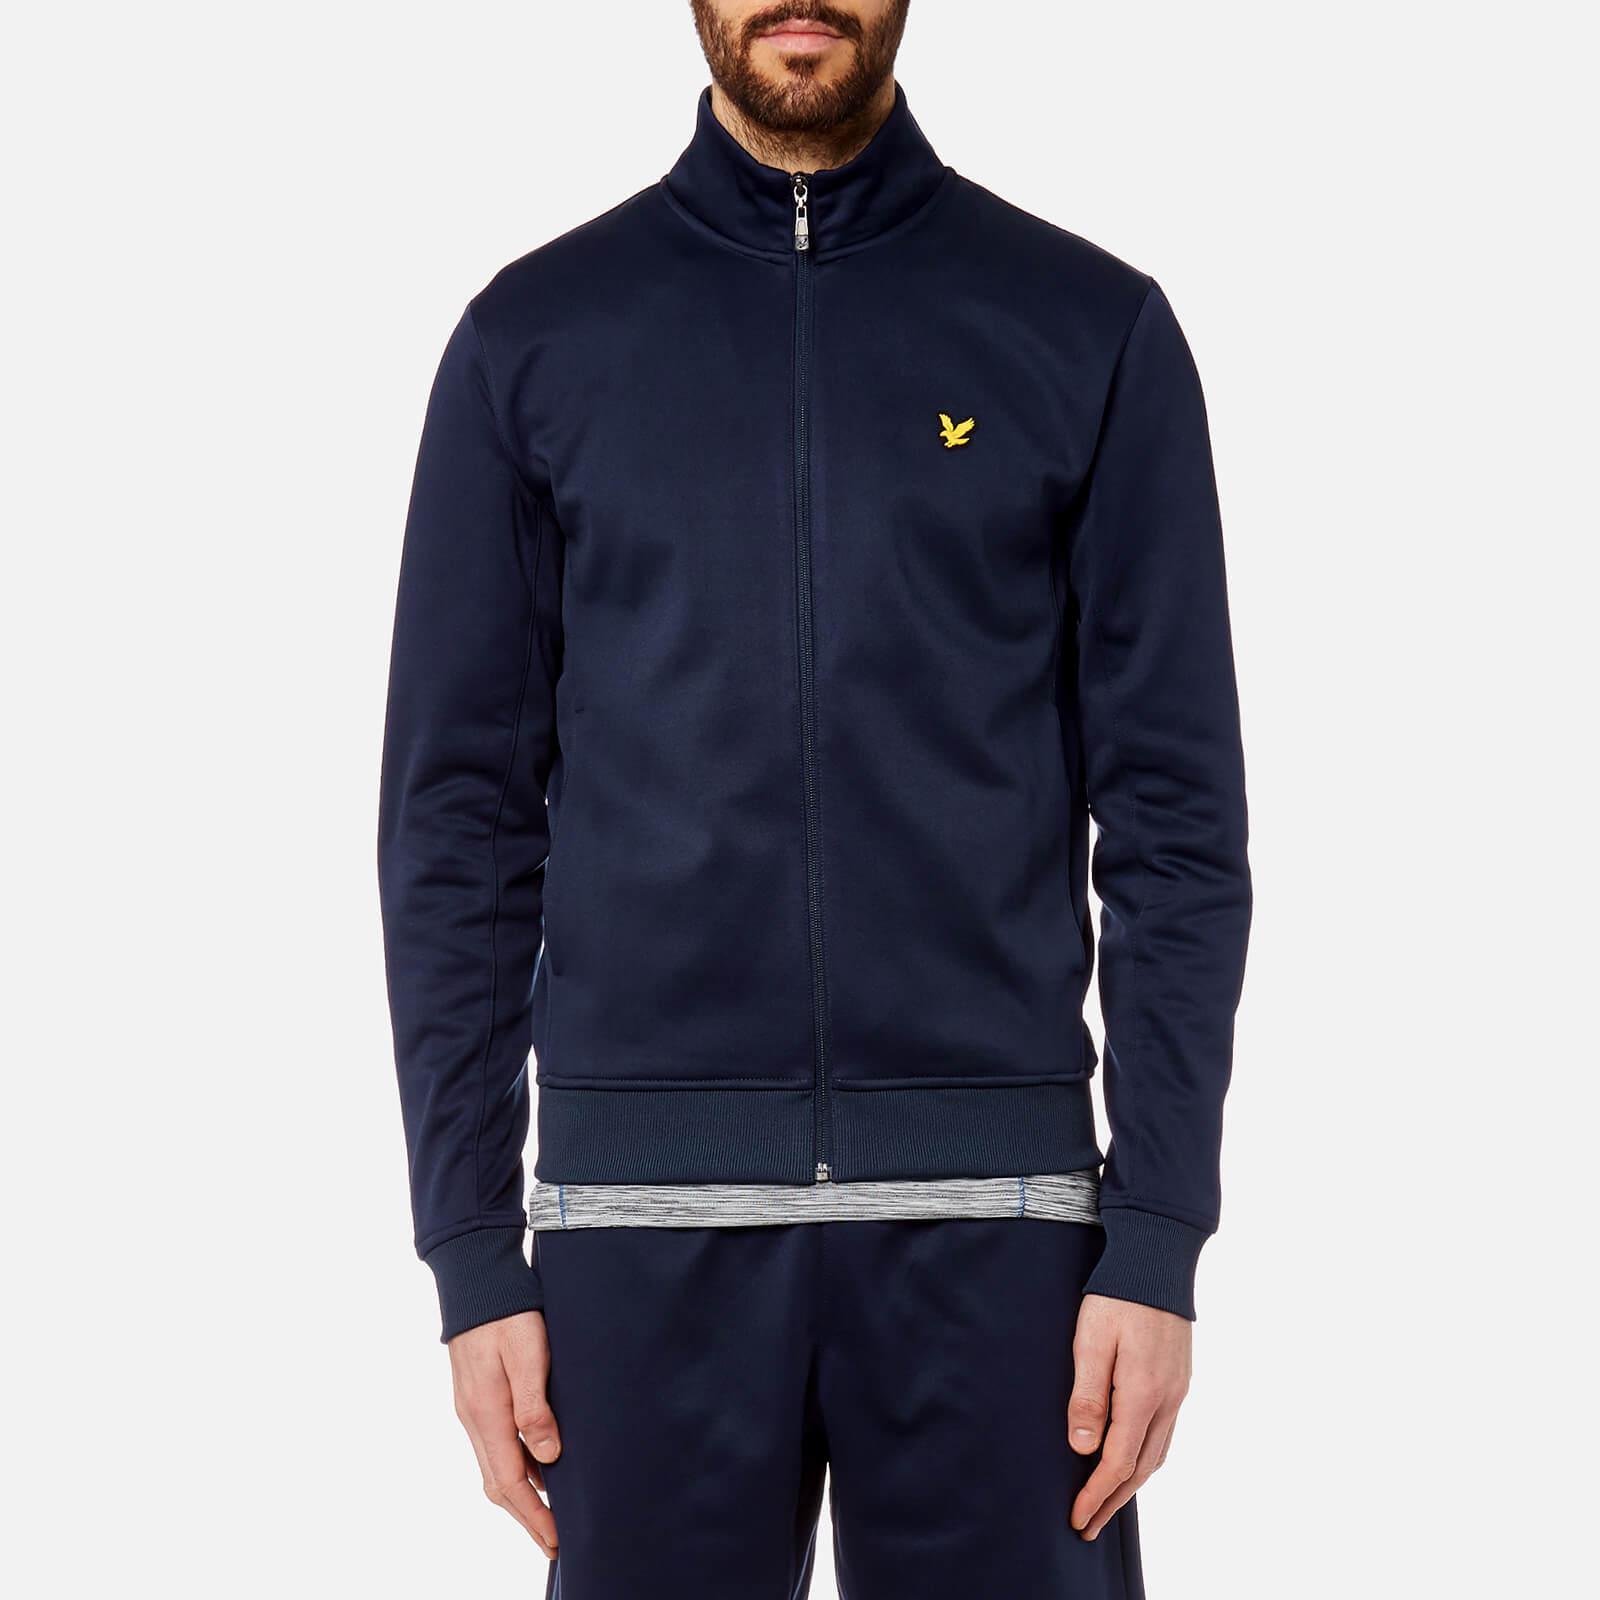 c639ff16a Lyle & Scott Blue Steel Funnel Neck Zip Through Sweatshirt for men